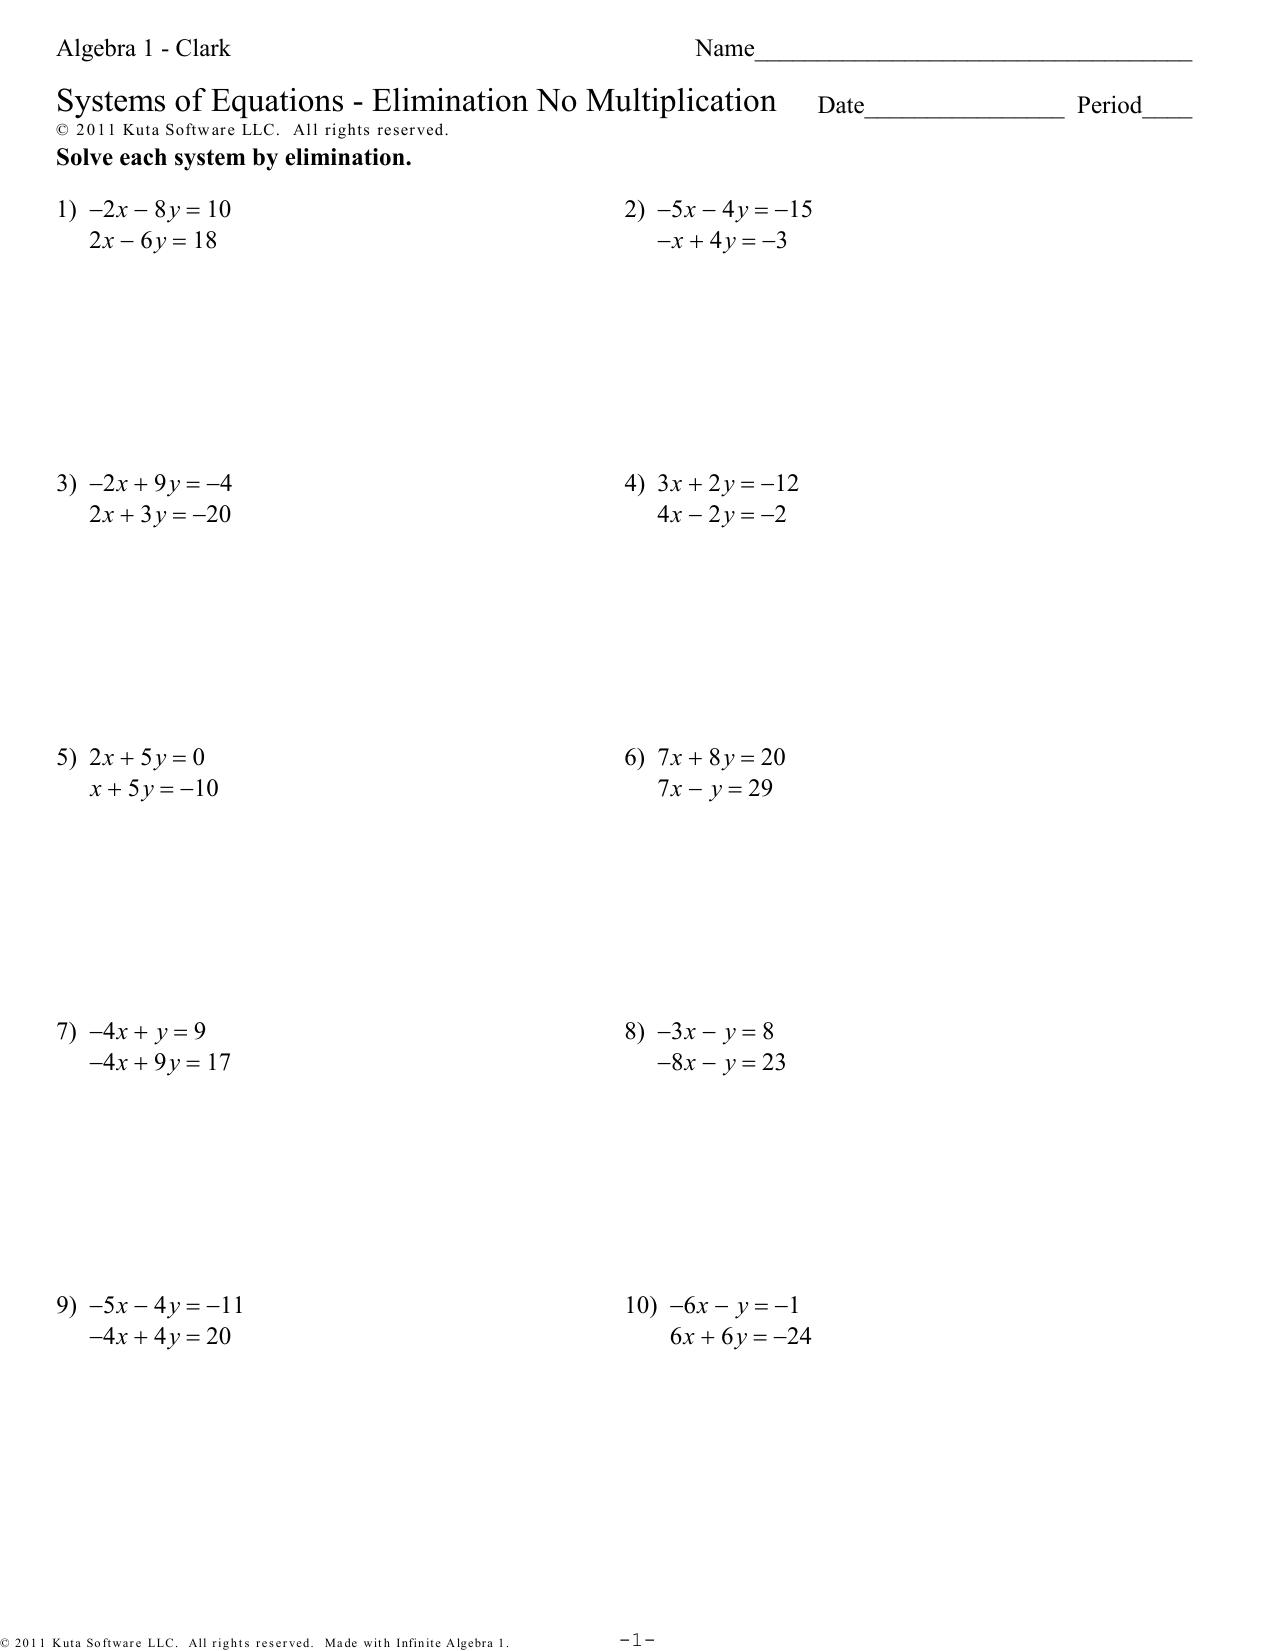 Algebra 1 - Clark - Systems of Equations